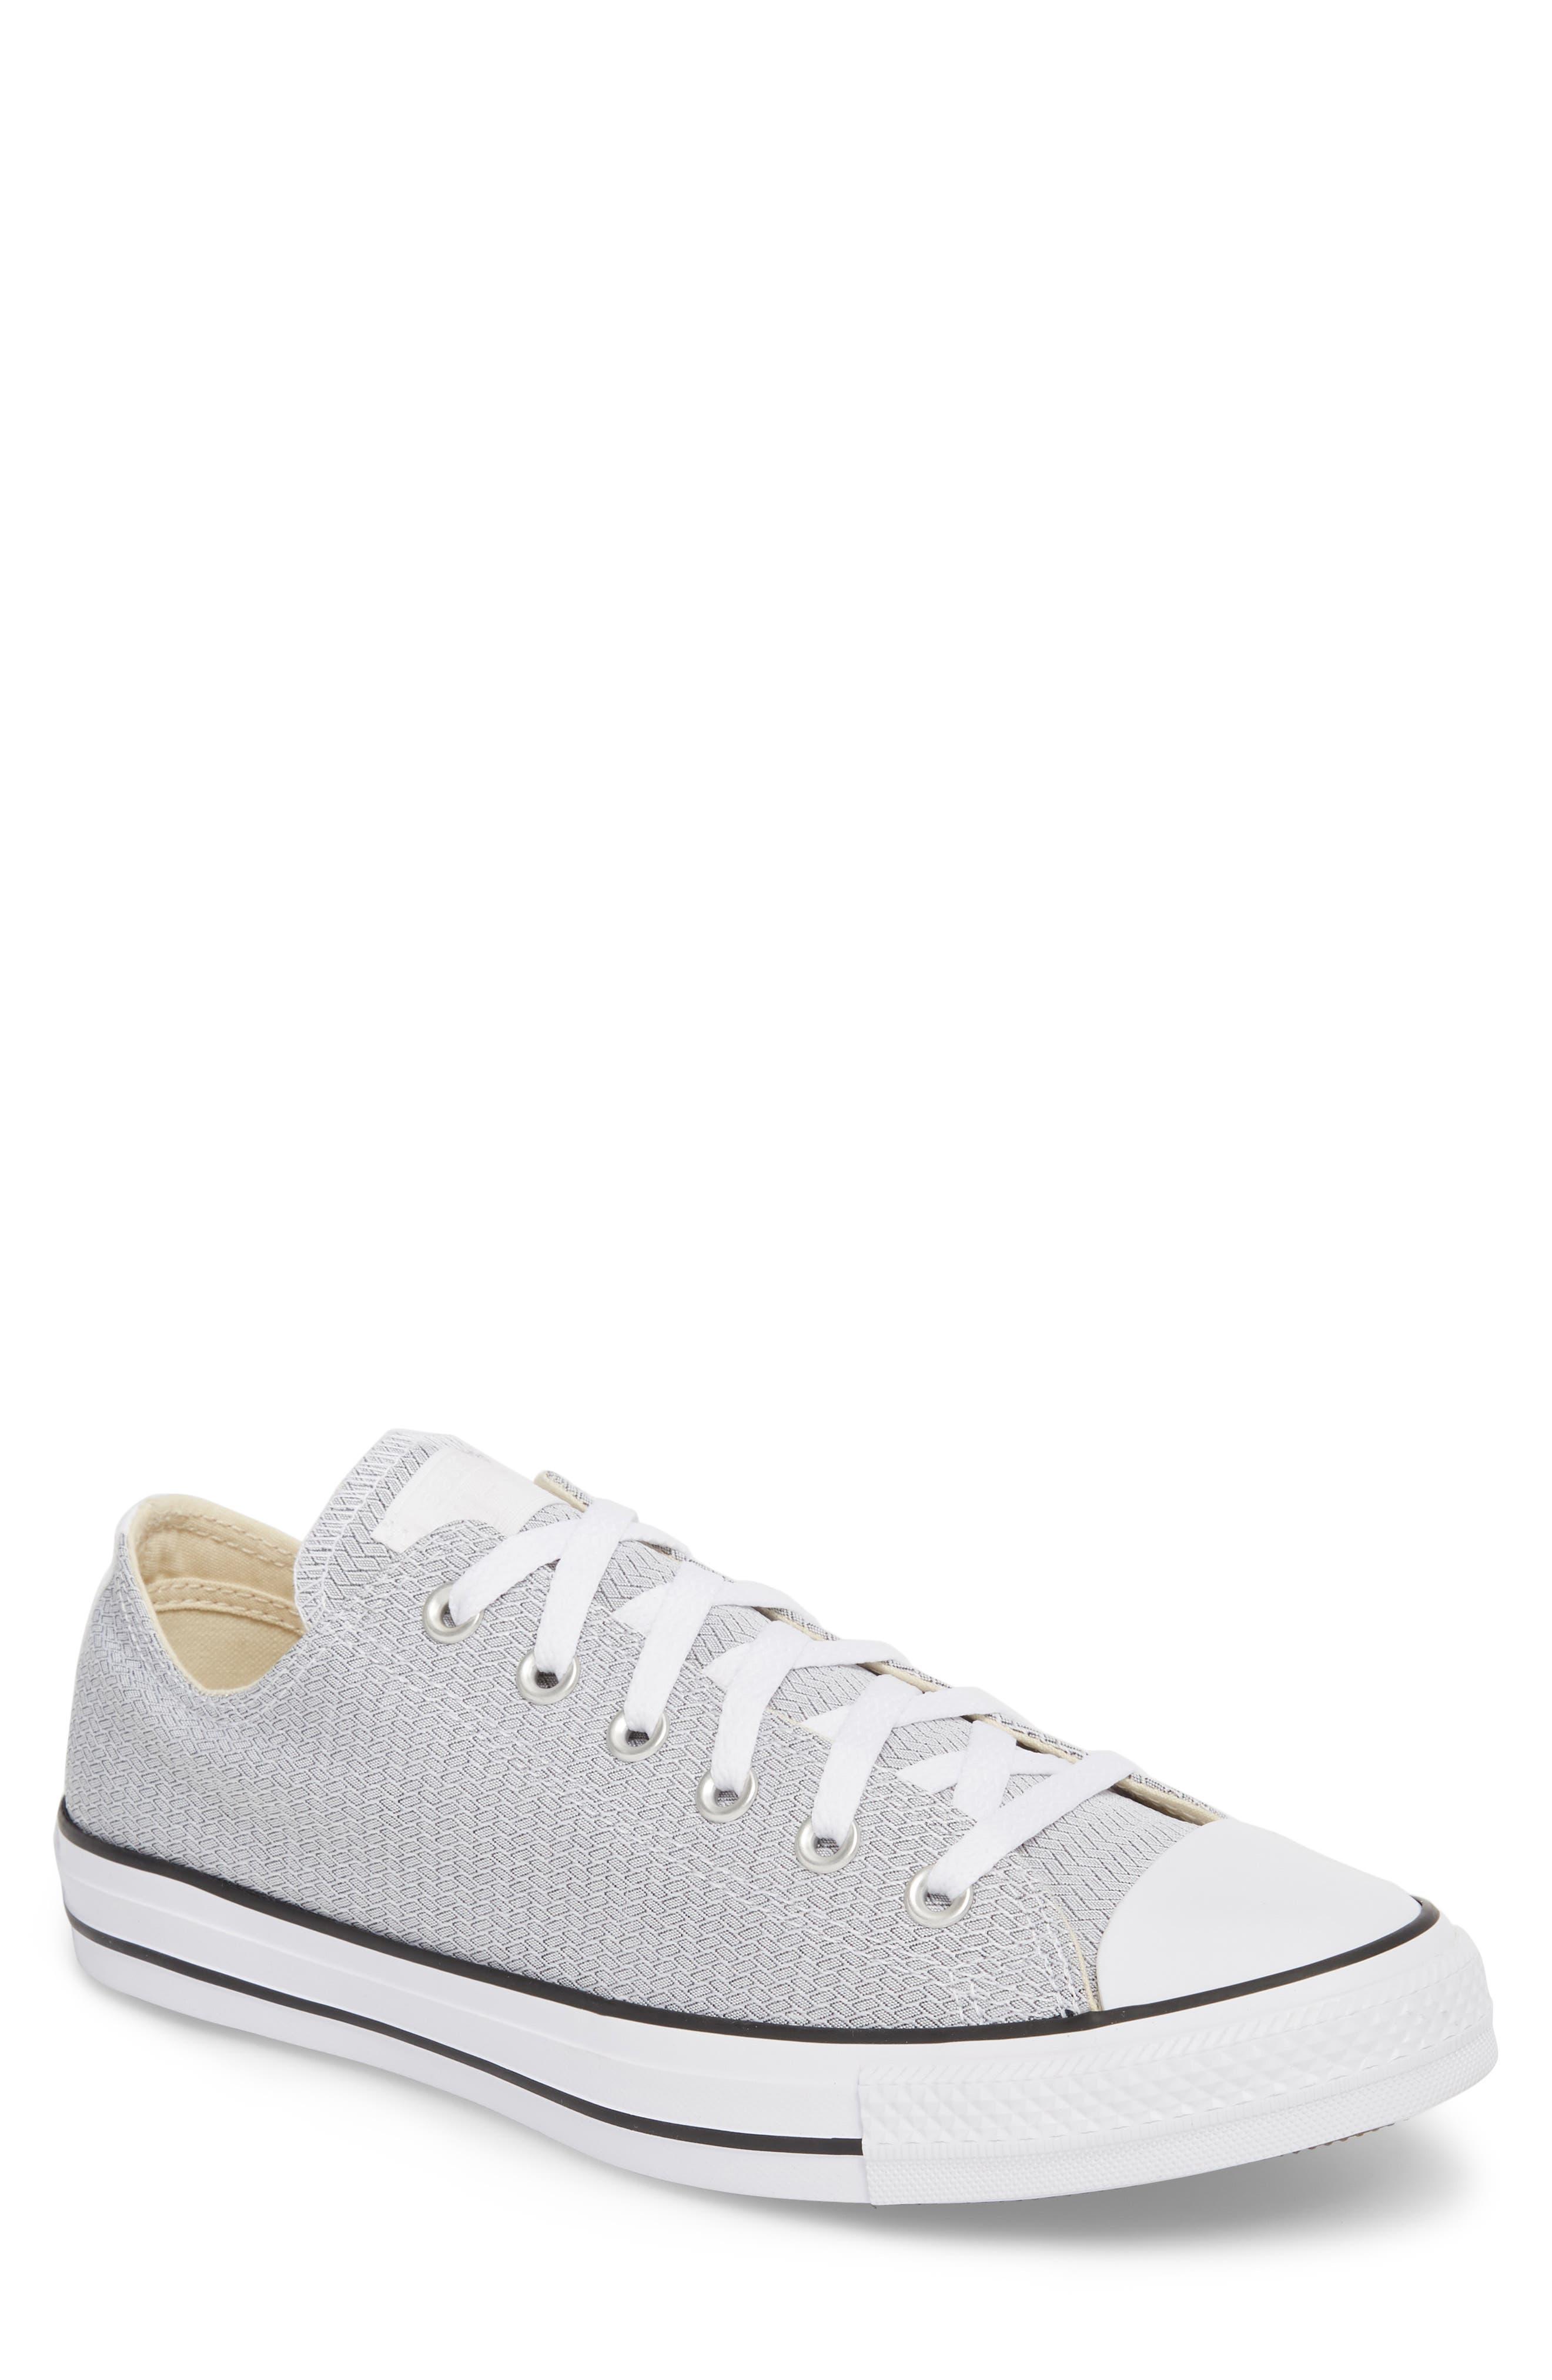 Converse All Star® Ripstop Low Top Sneaker (Men)